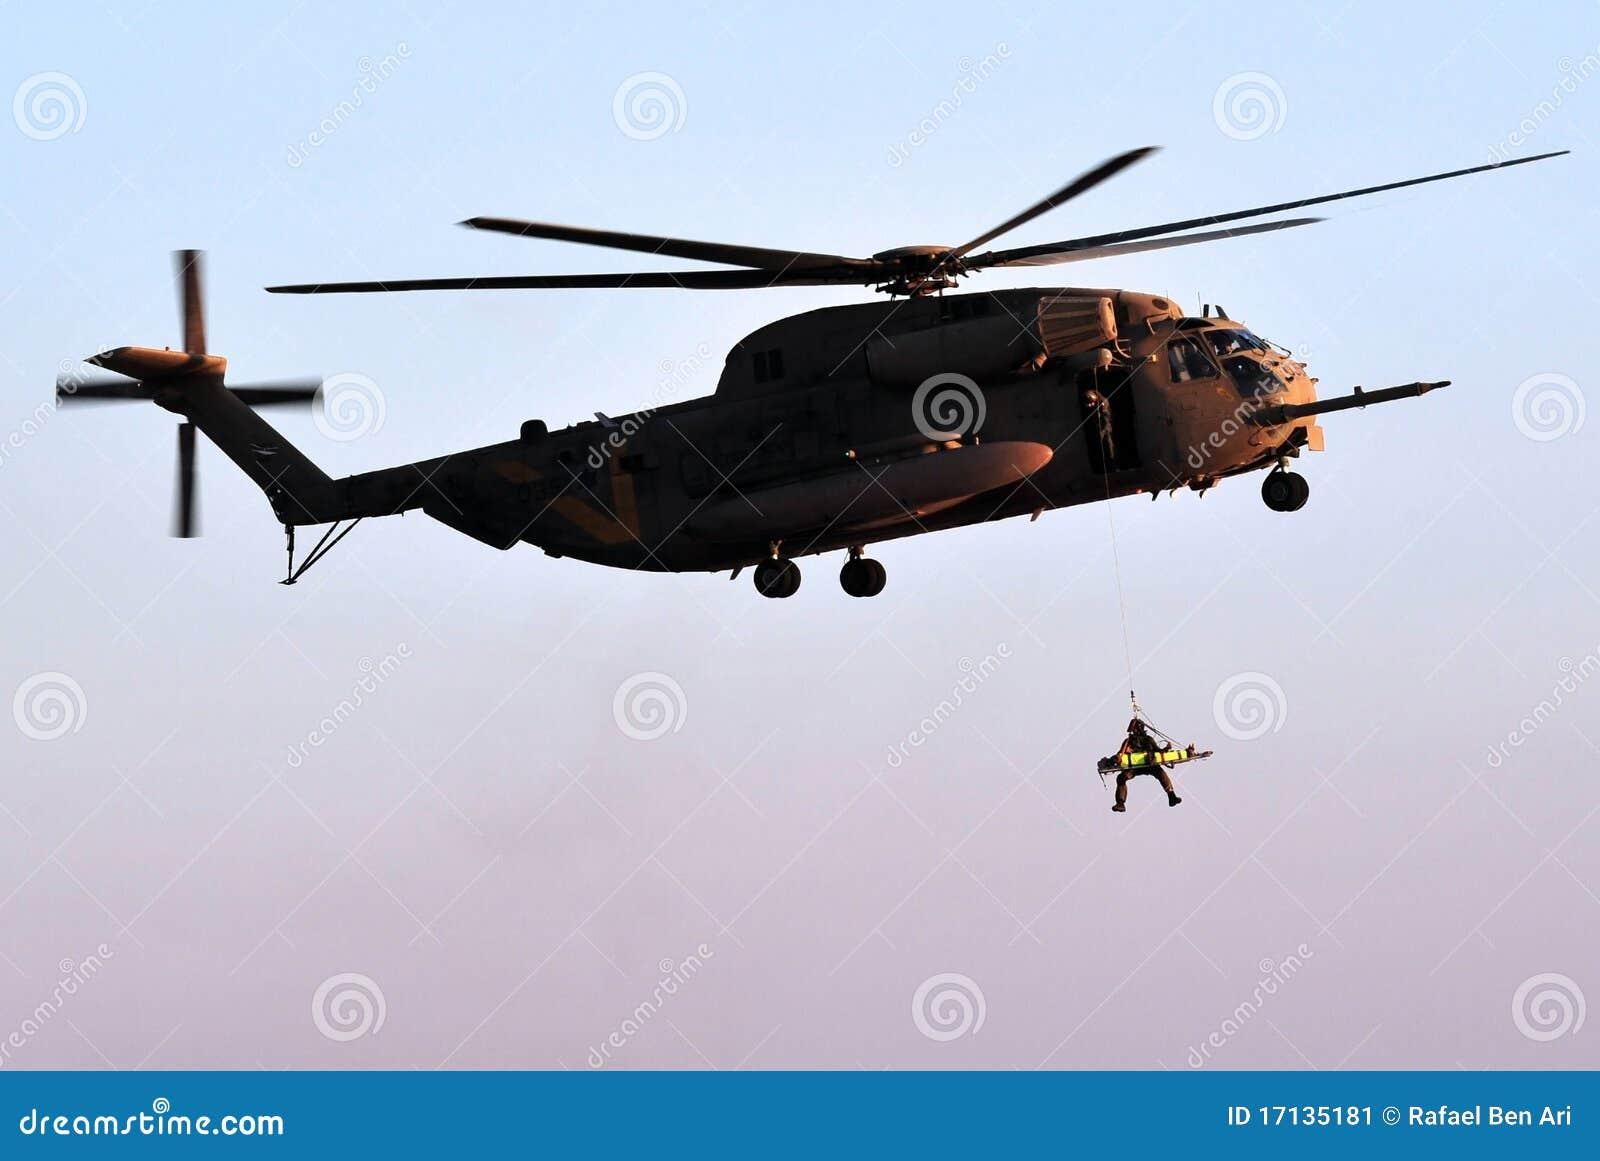 Elicottero 7 Posti : 陆军直升飞机营救